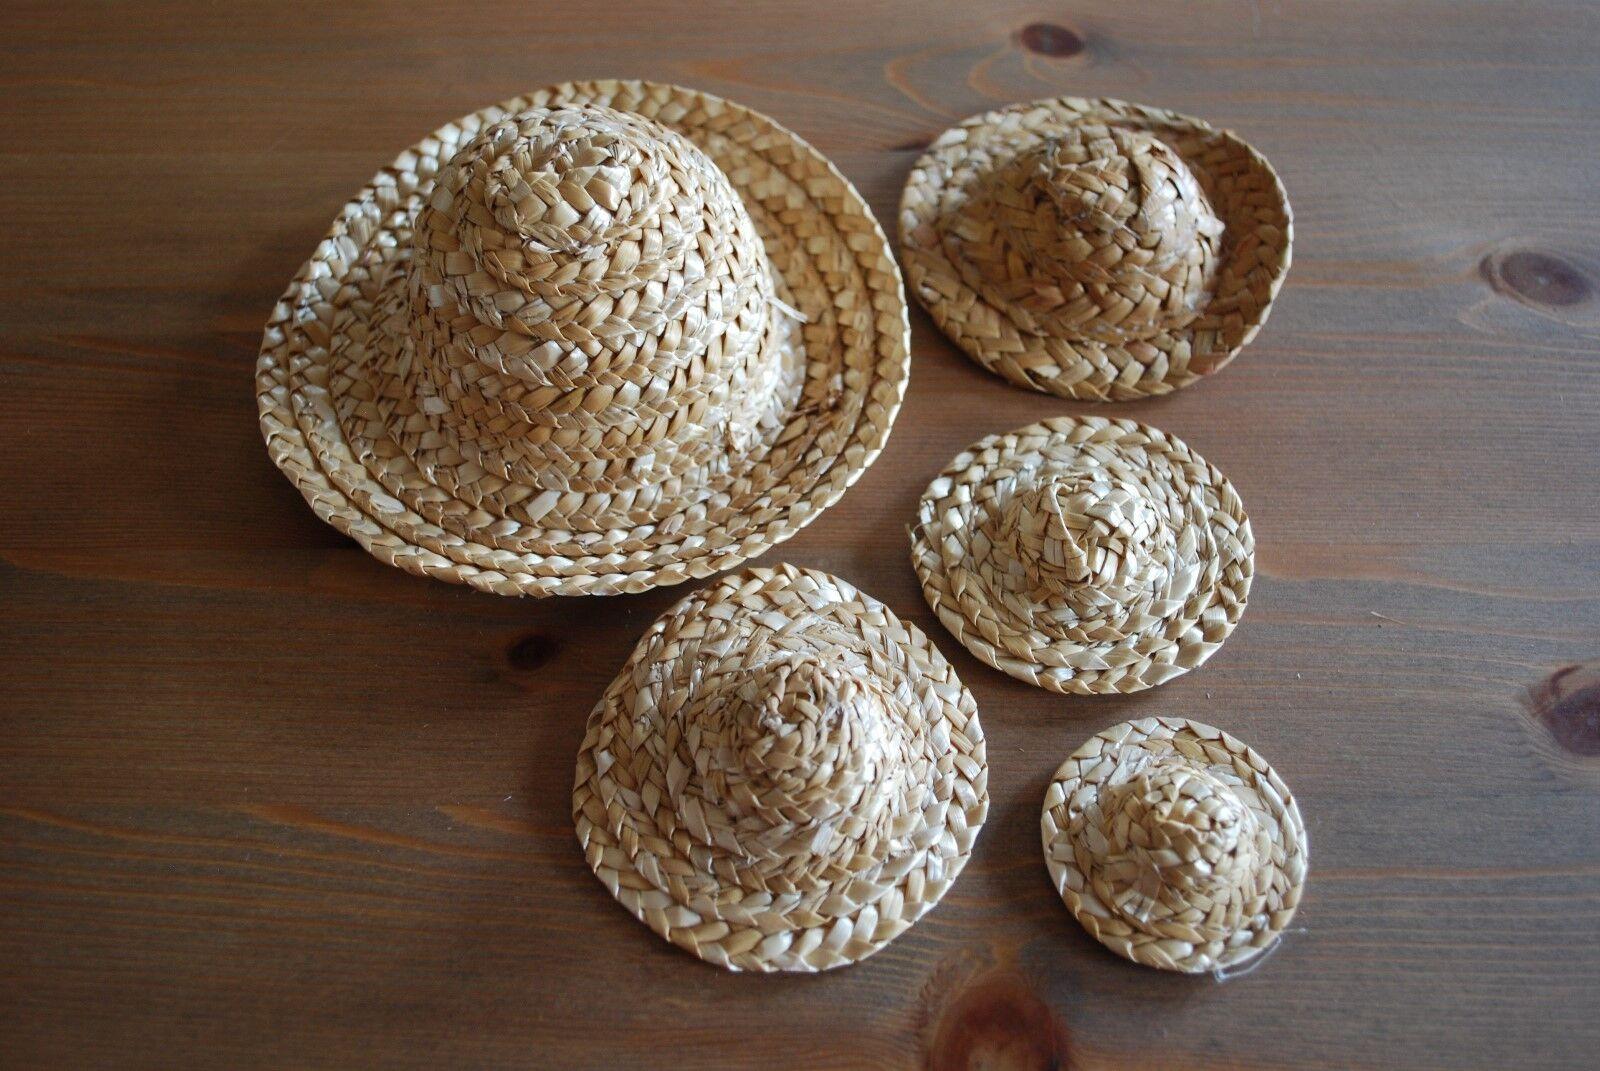 Sonnenhut Strohhut, Acccessoire für Puppen oder Bären, versch. Größen verfügbar